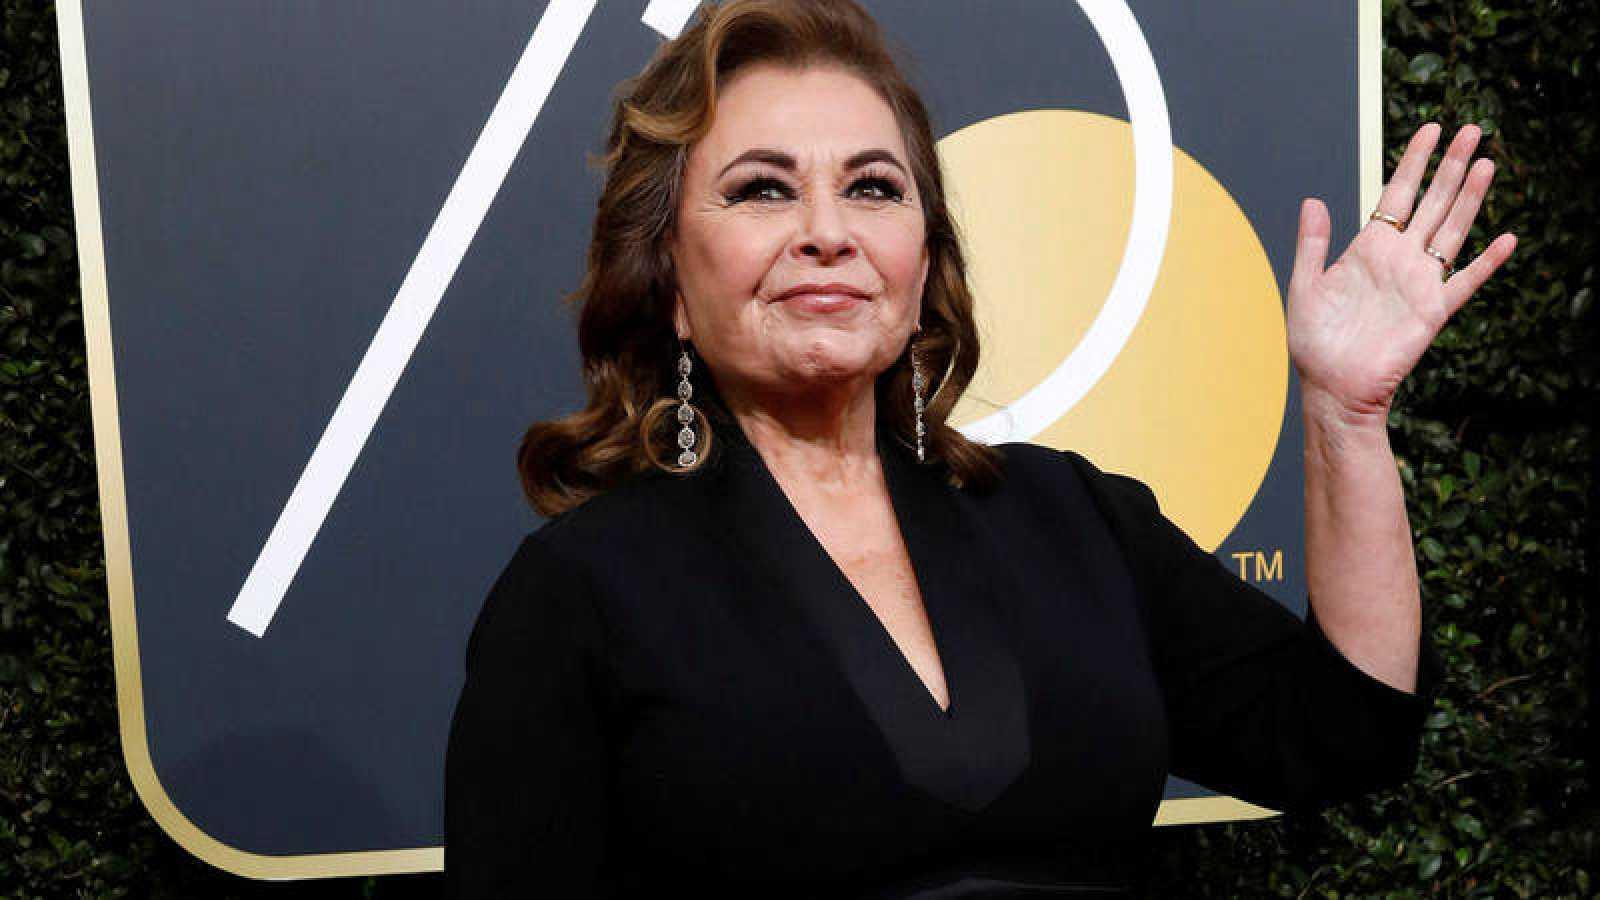 ABC Cancela La Serie Roseanne Tras Un Comentario Racista De Barr